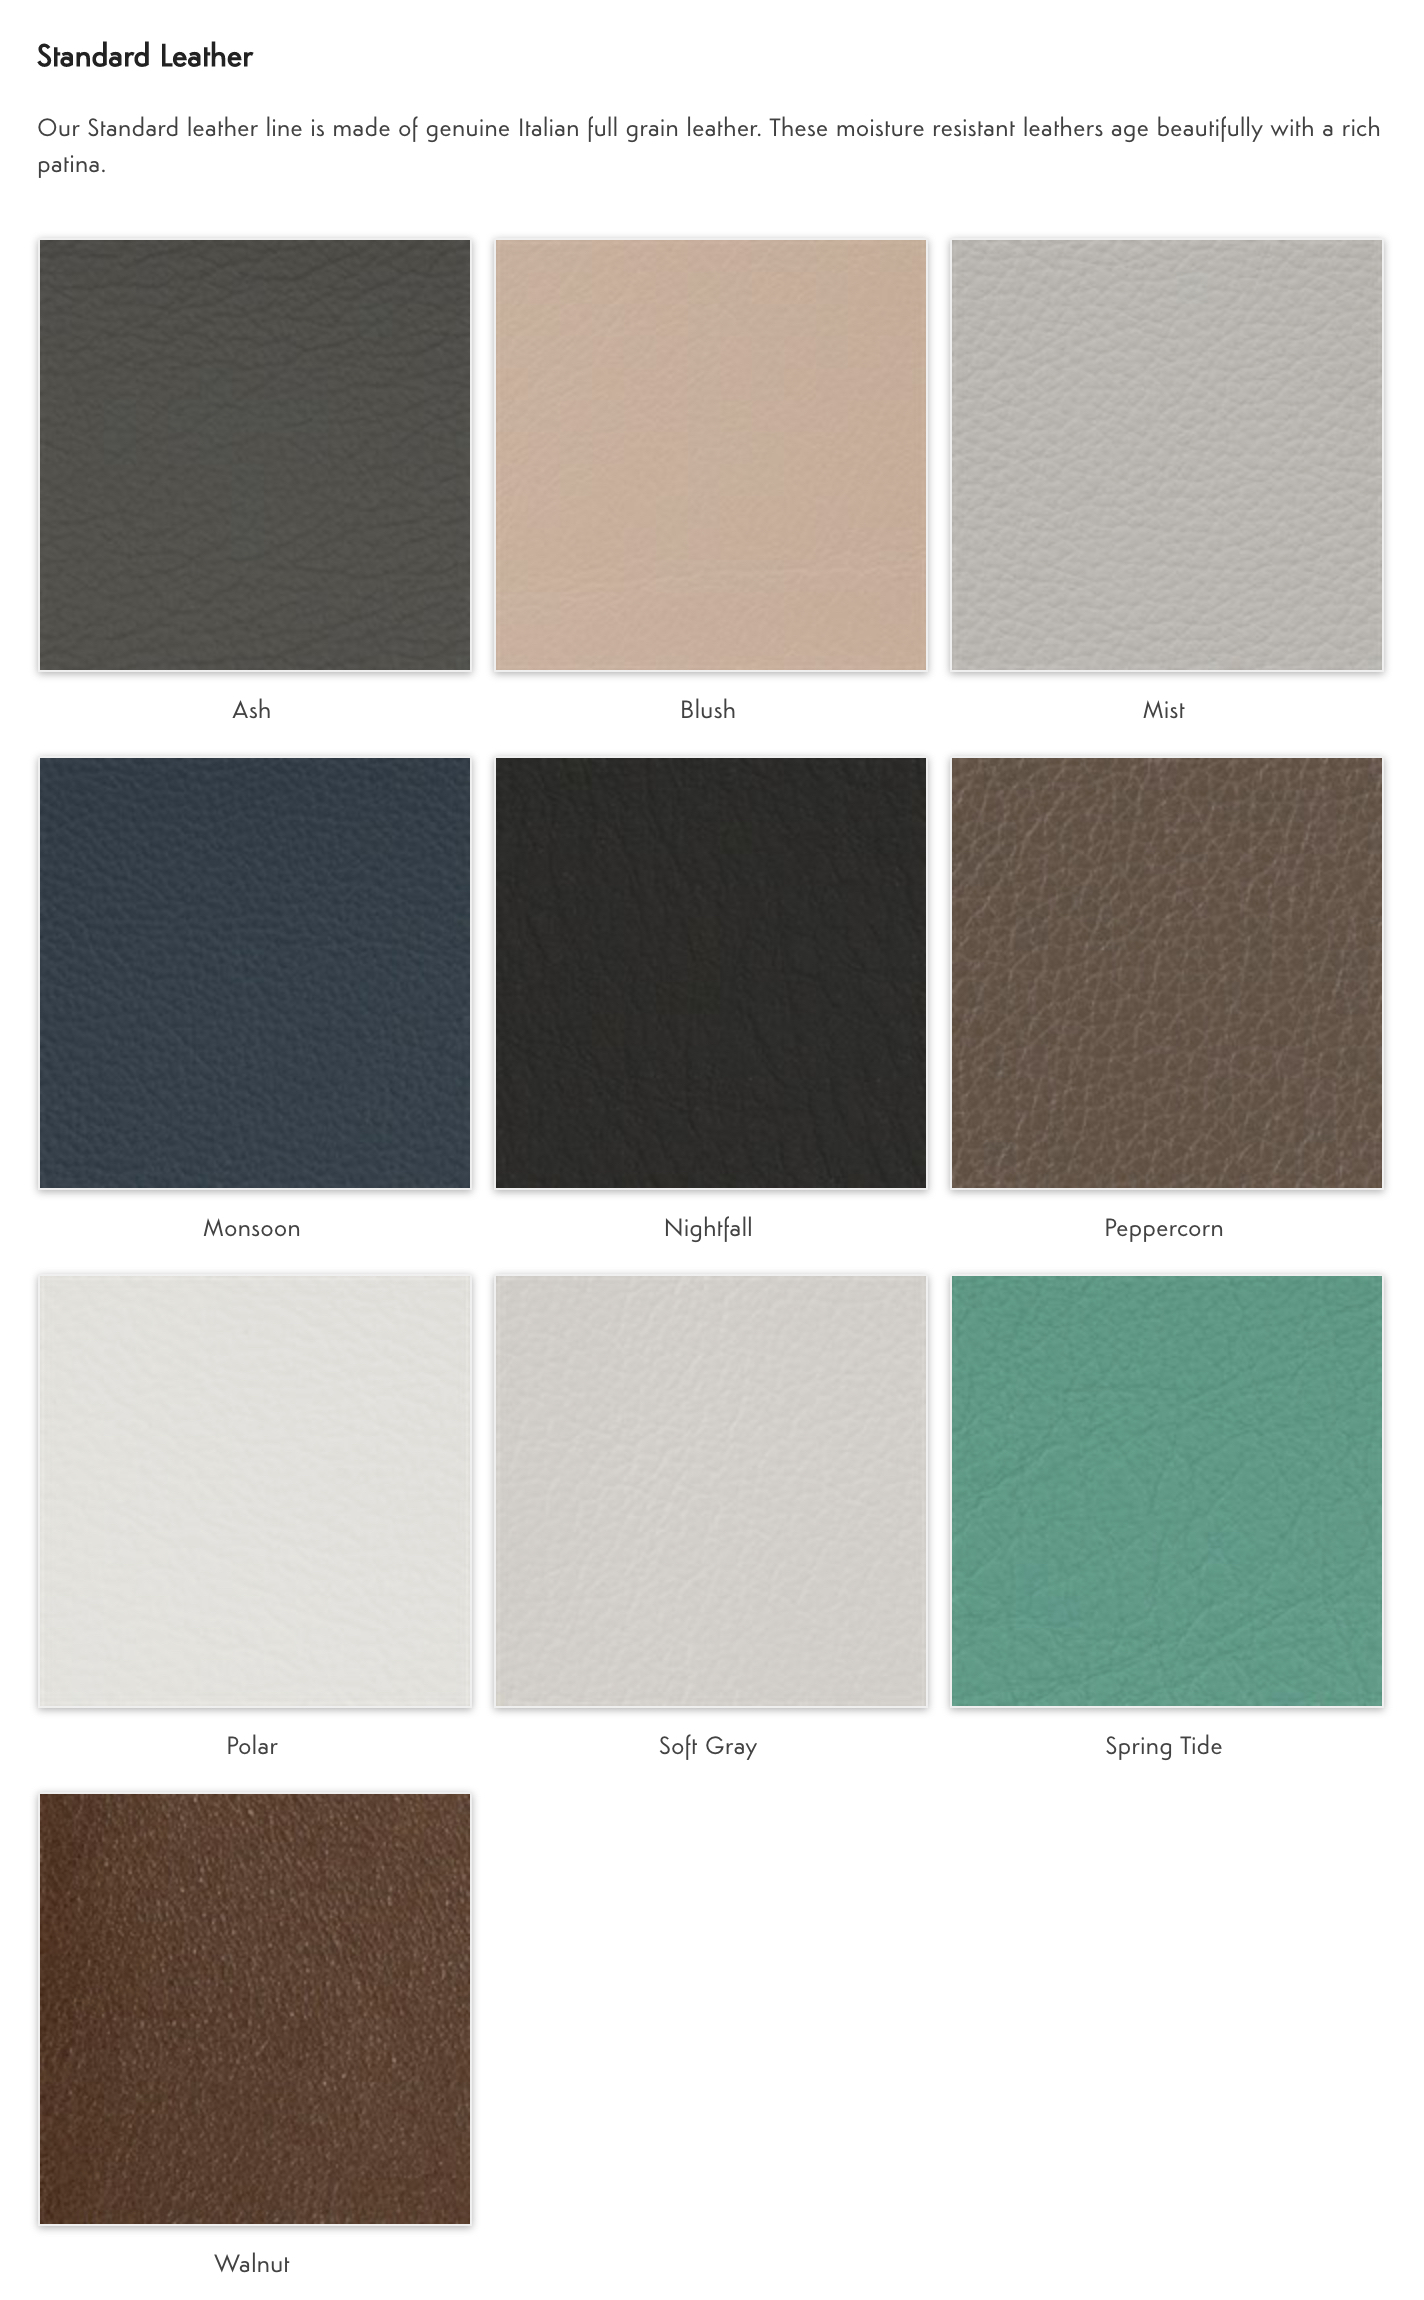 Album Covers - Leather.jpg